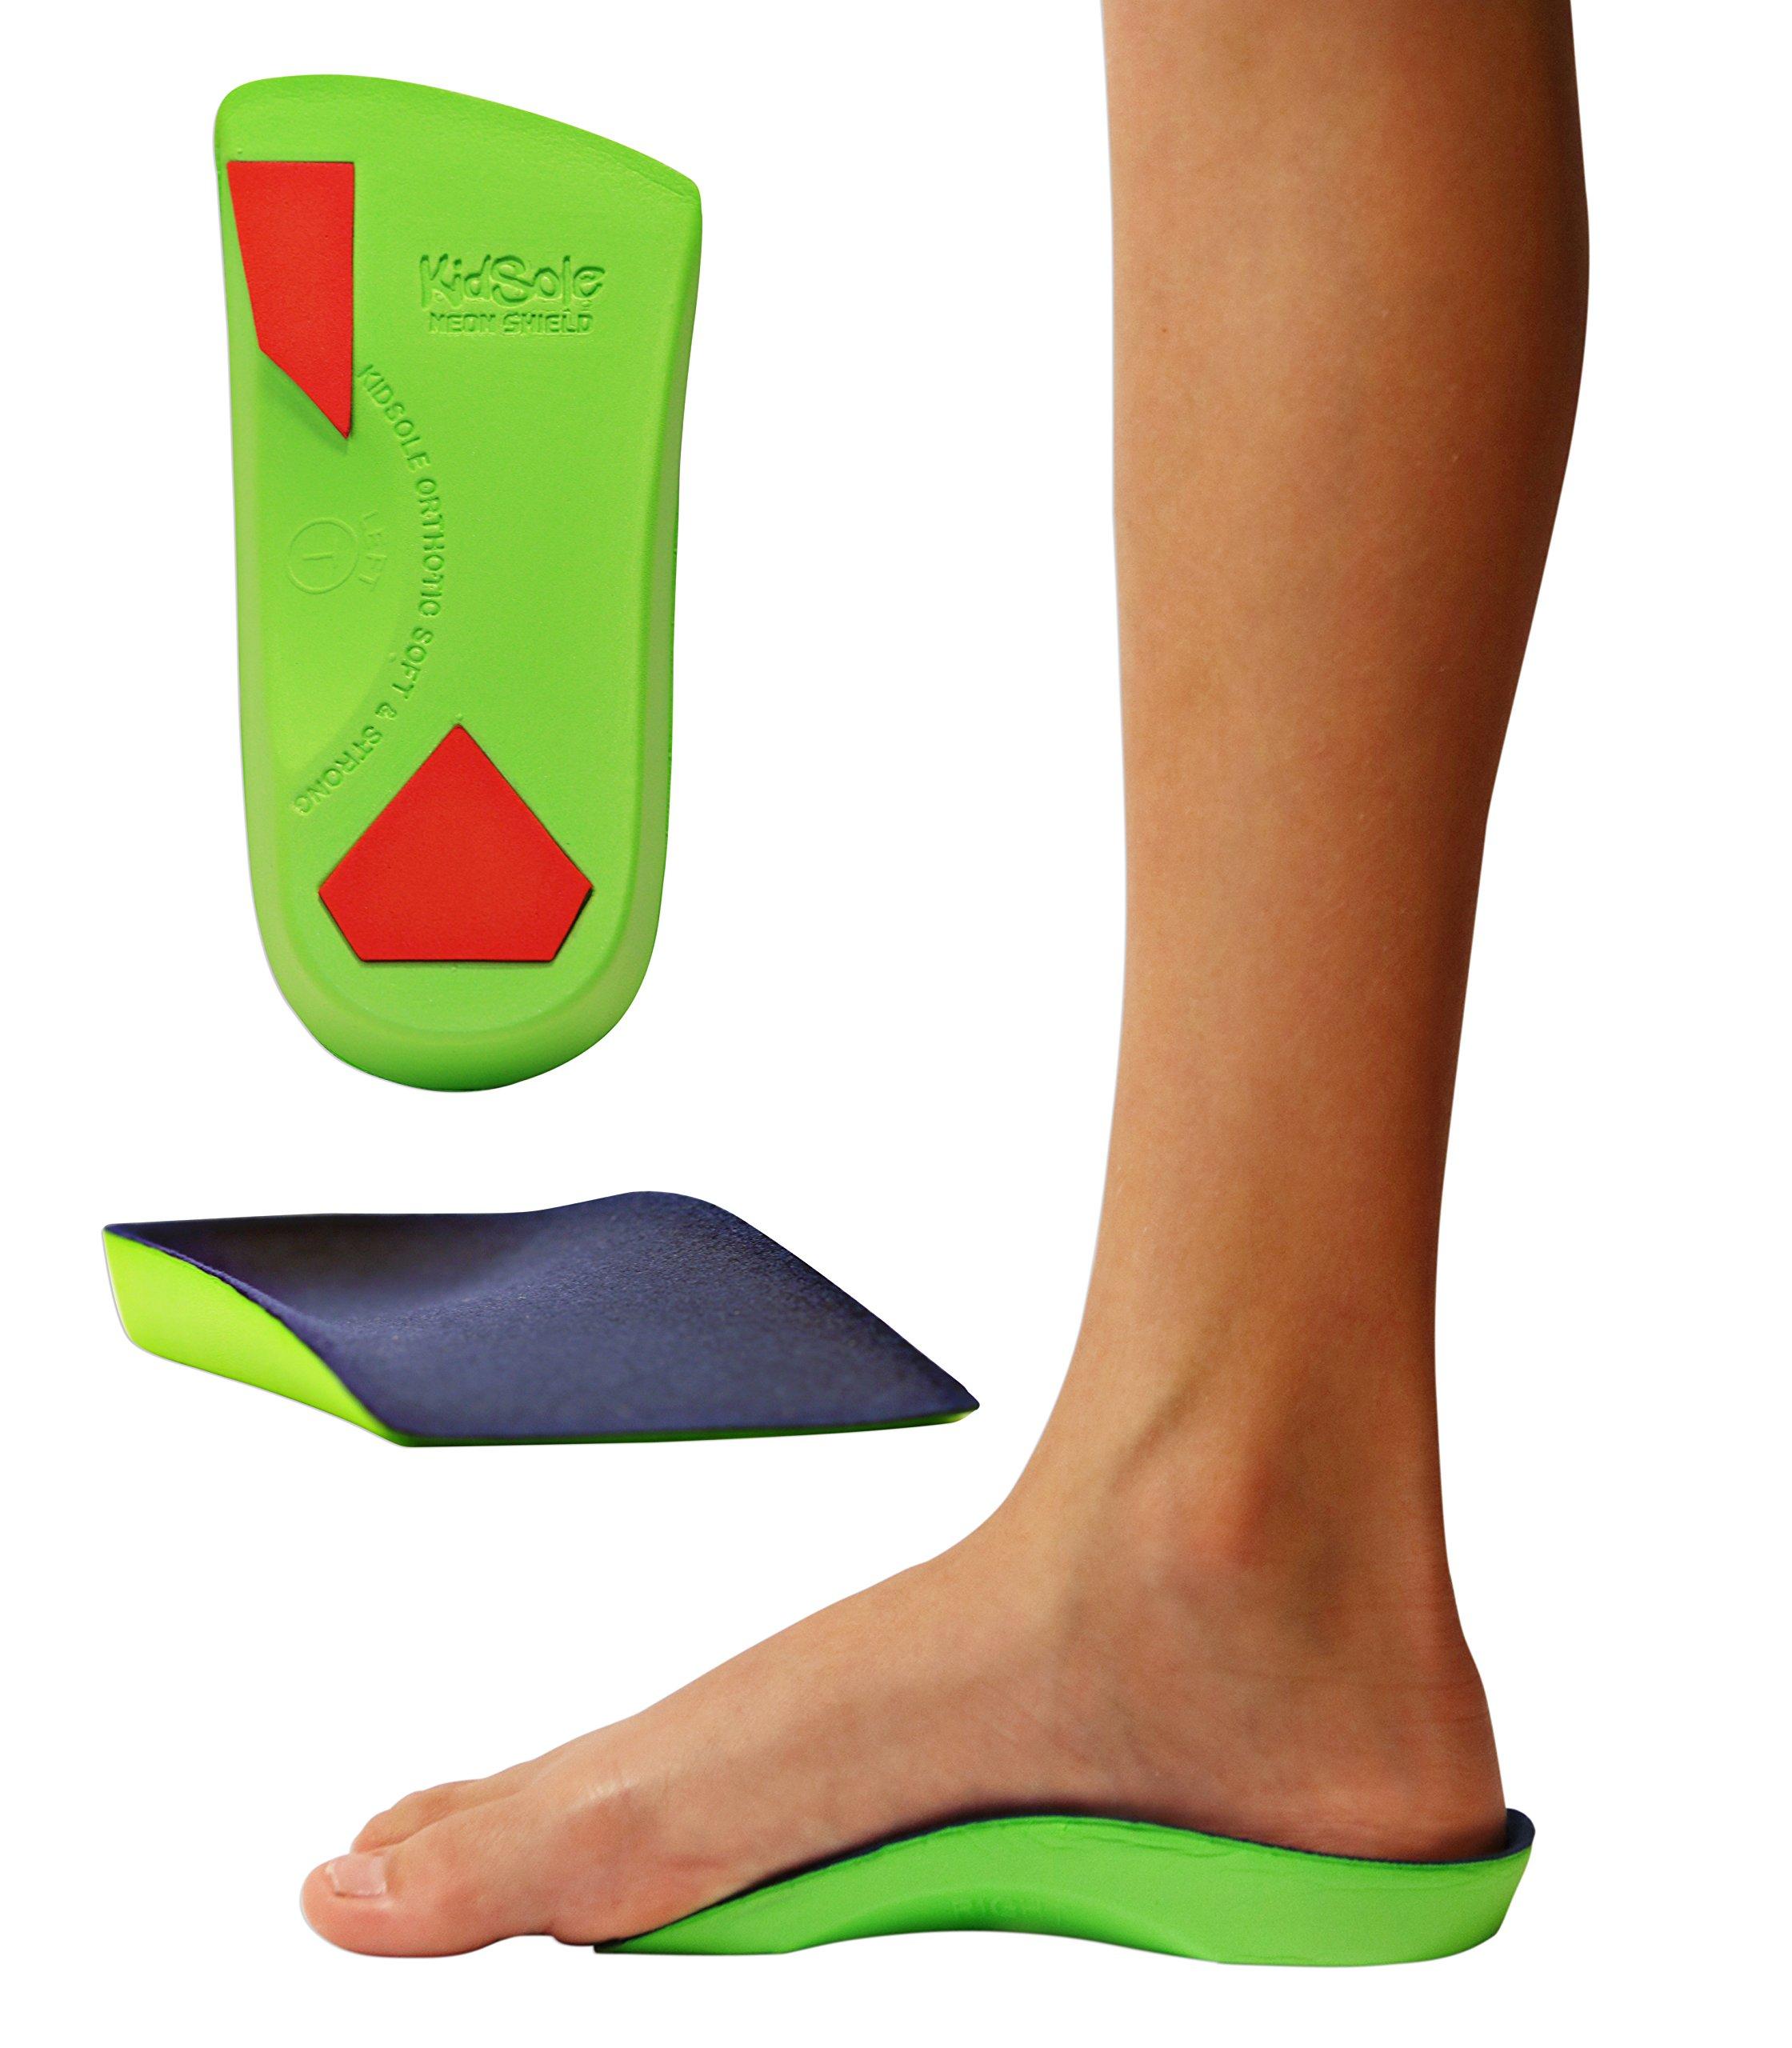 kids with foot pronation, flat feet